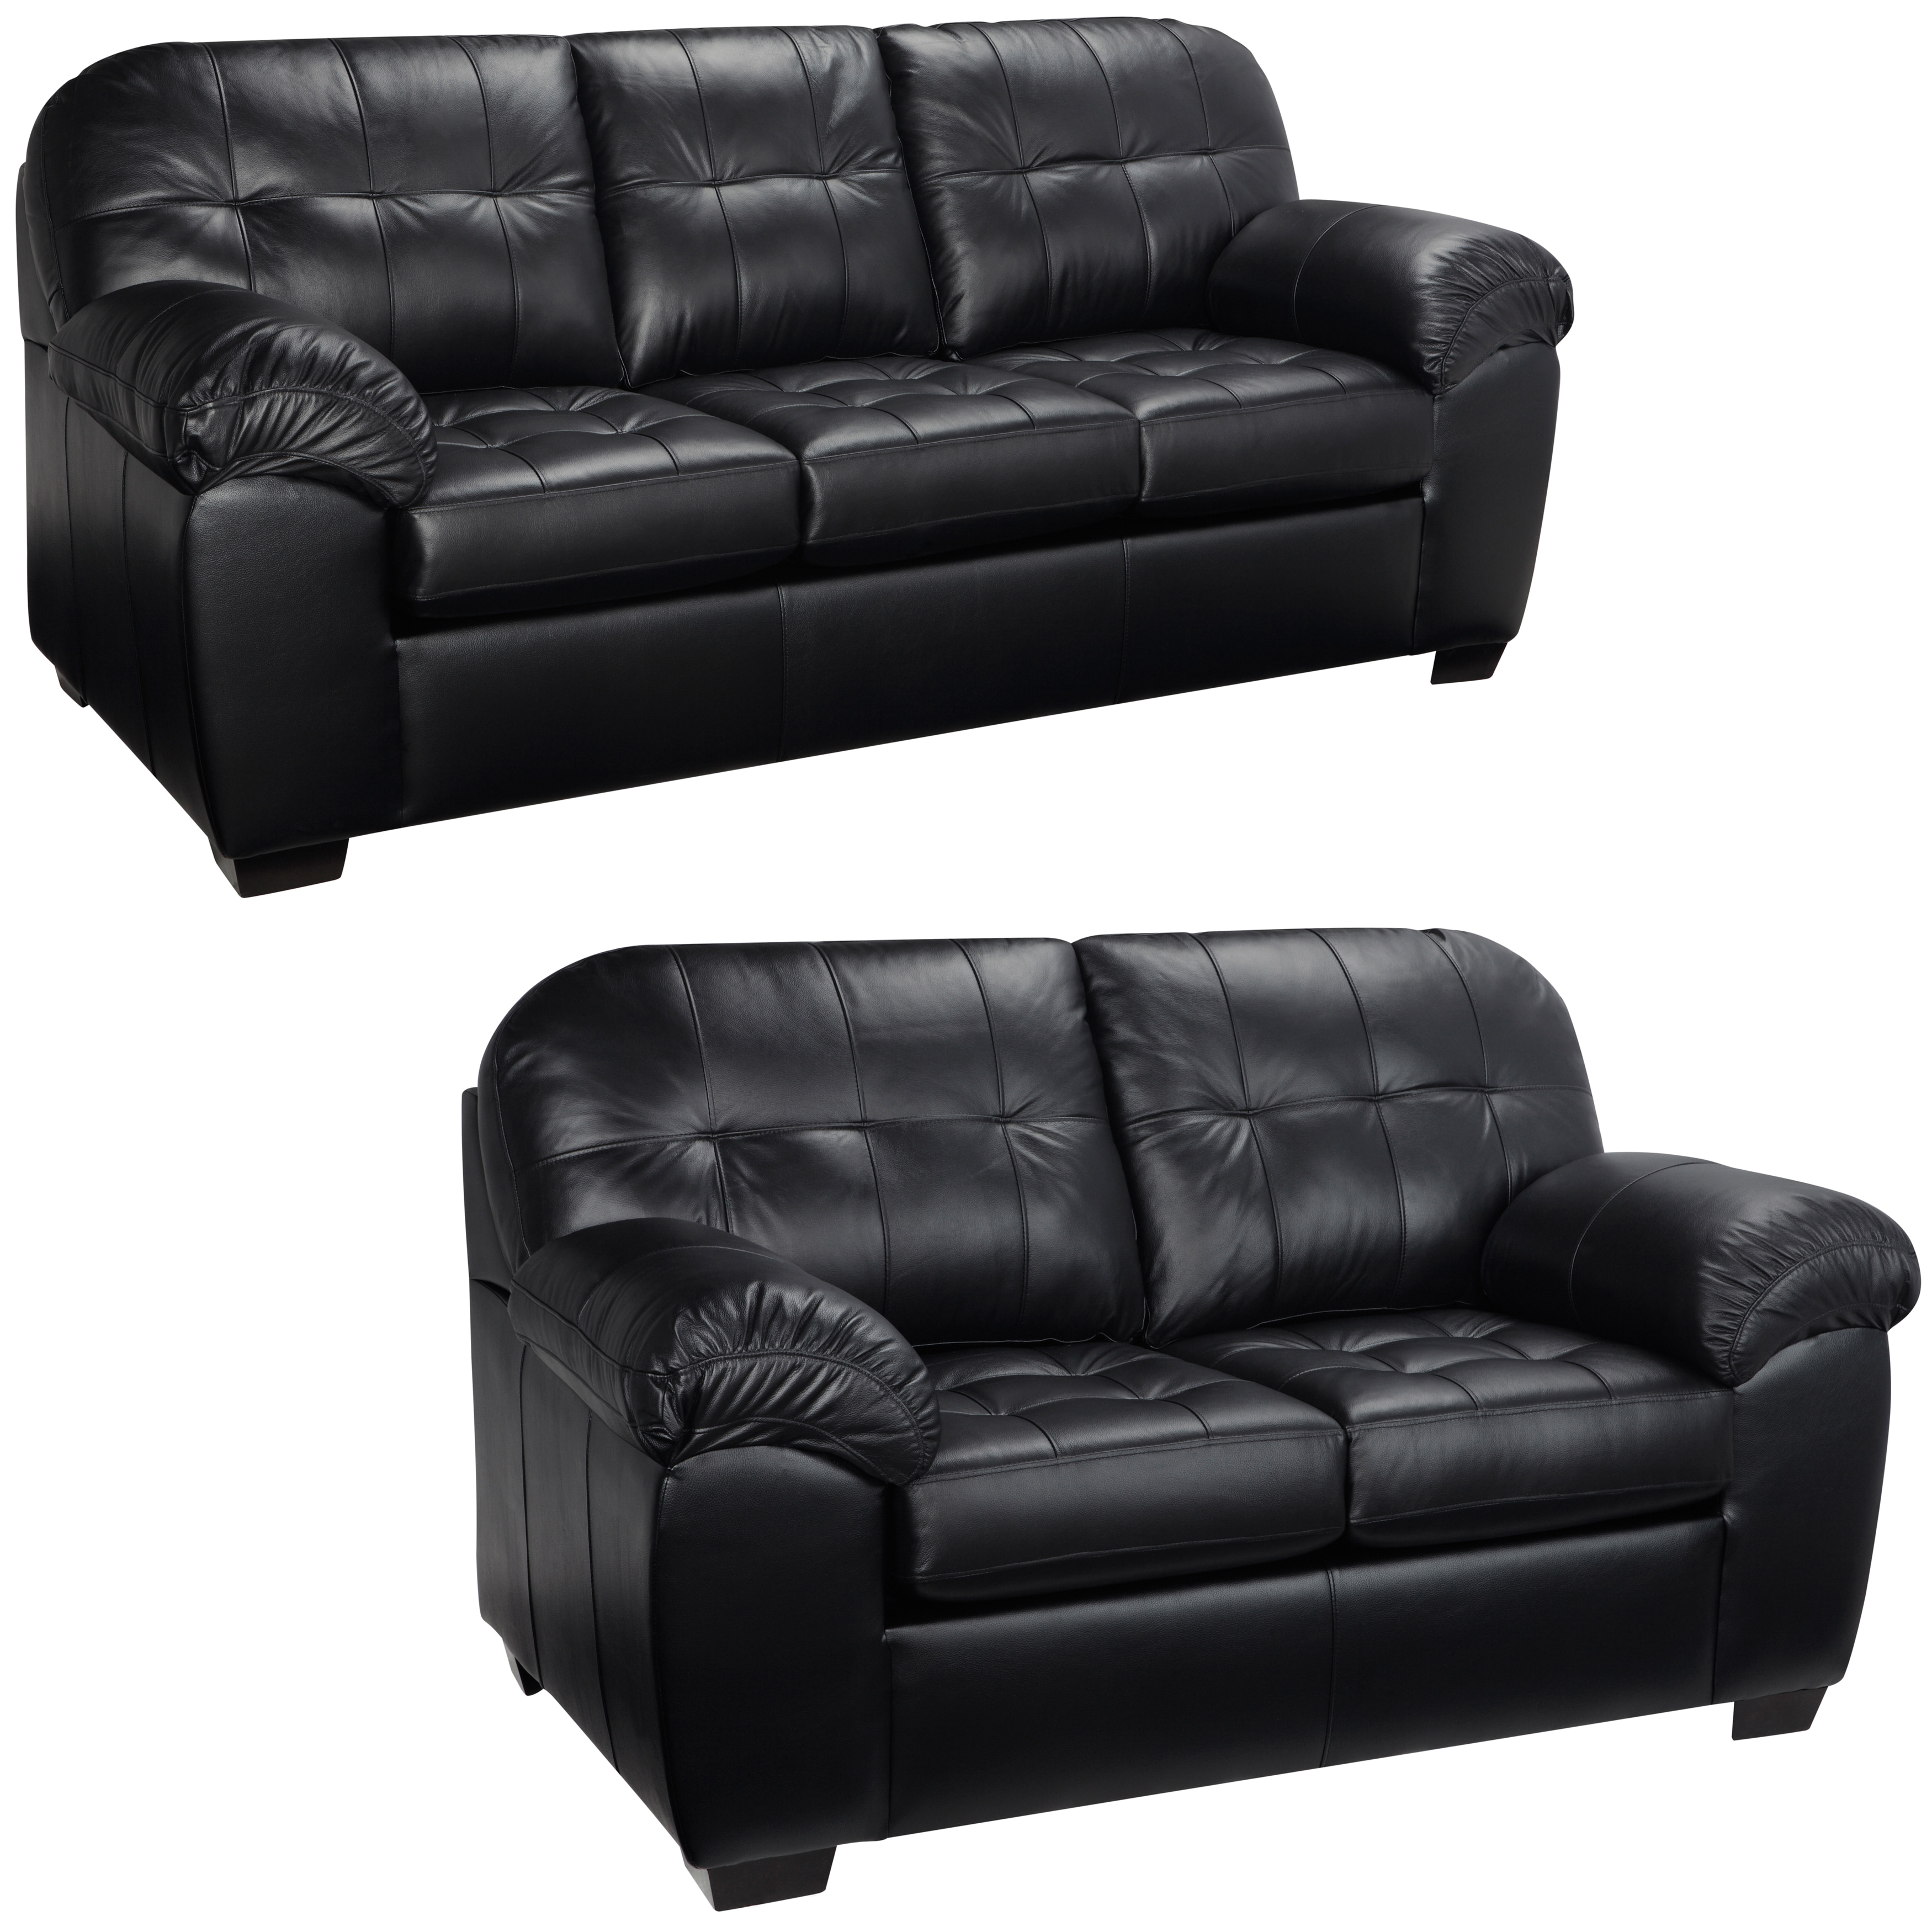 emma tufted sofa comprar sofas cama baratos online black leather and loveseat 91 best reclining